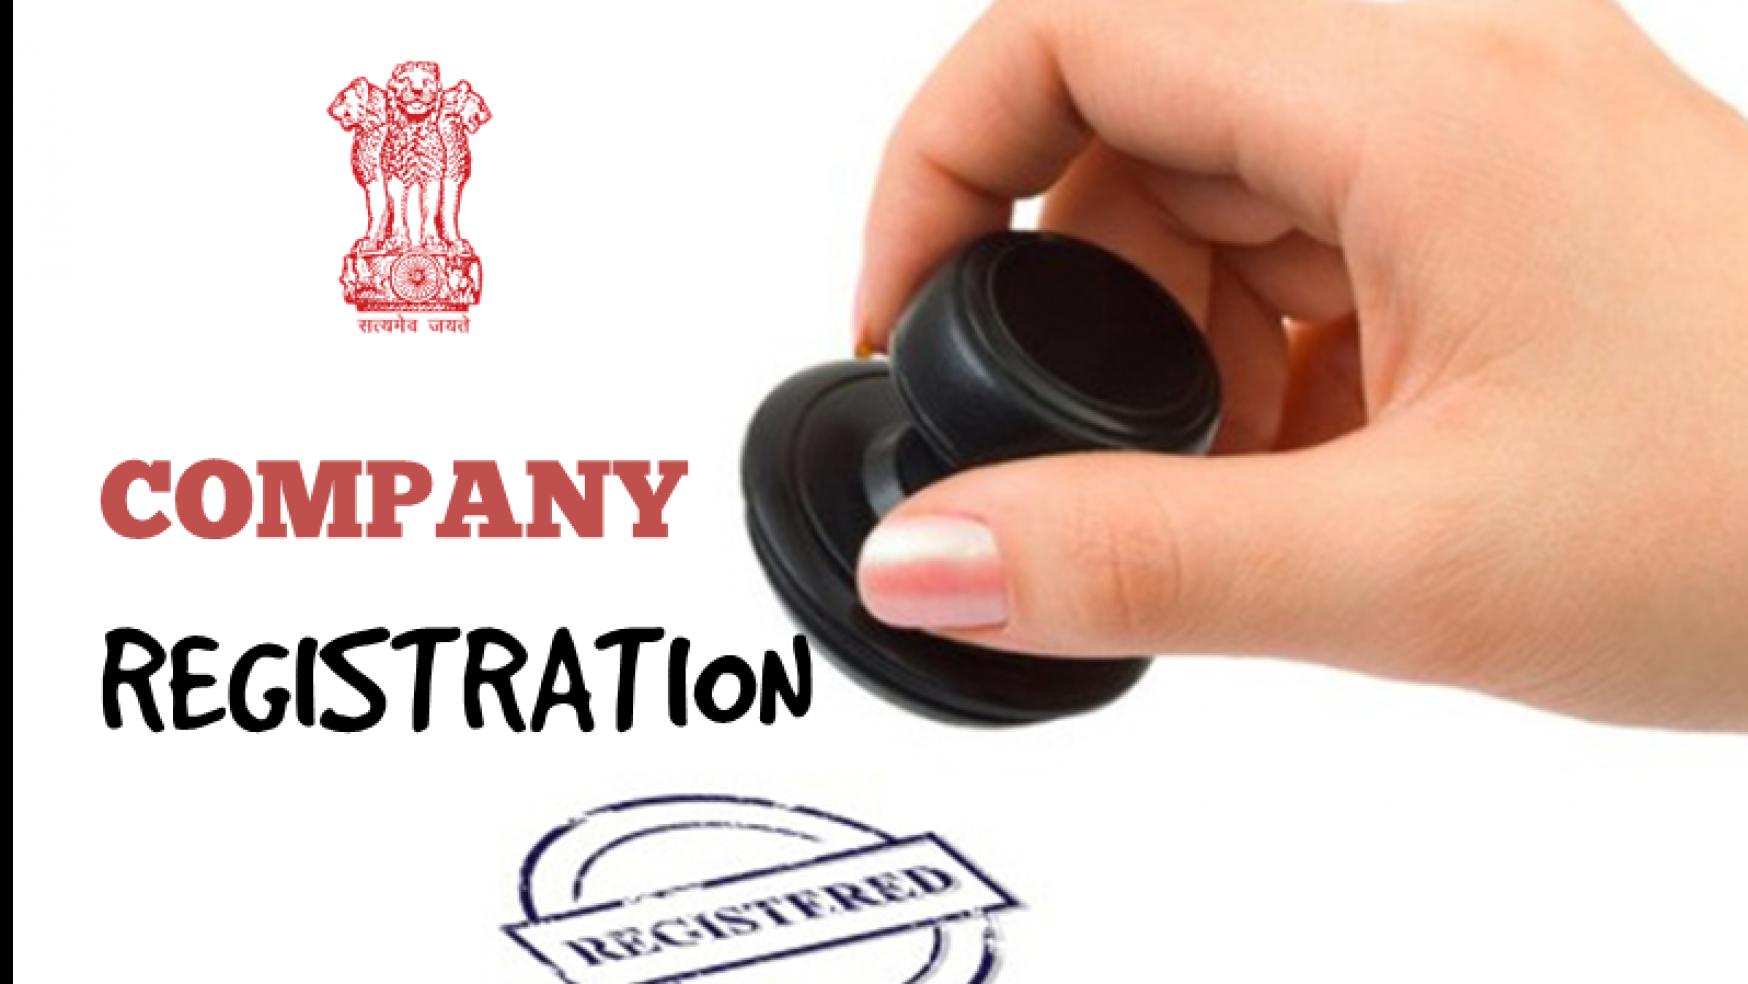 Company-Registration-1748x984